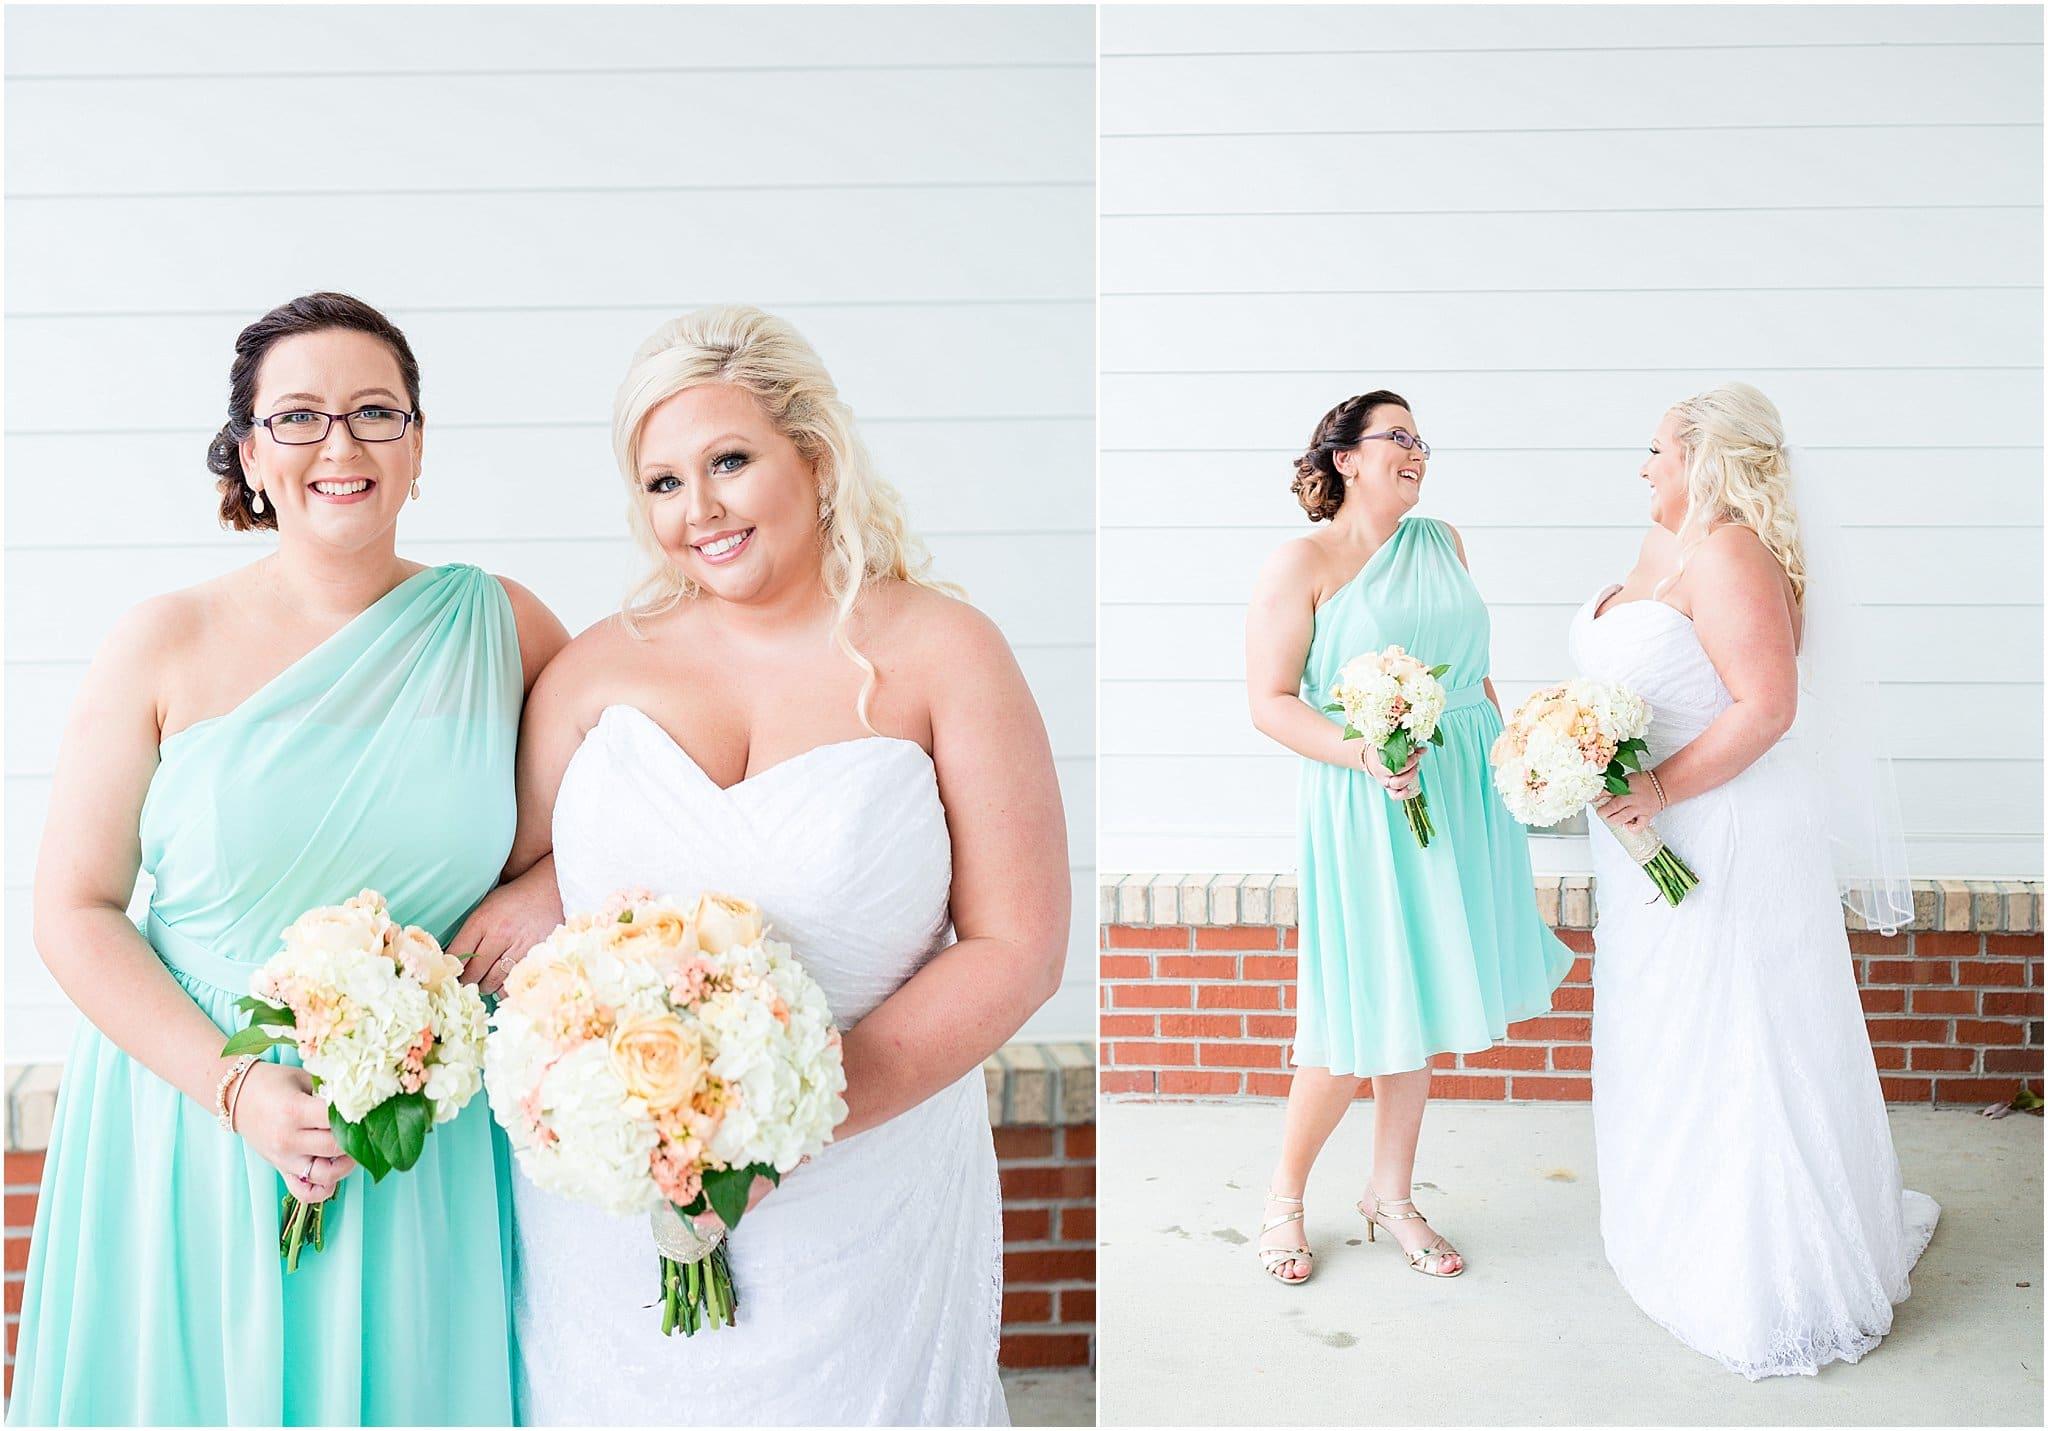 jessscott-milsboro-delaware-wedding-cassidymrphotography_0029